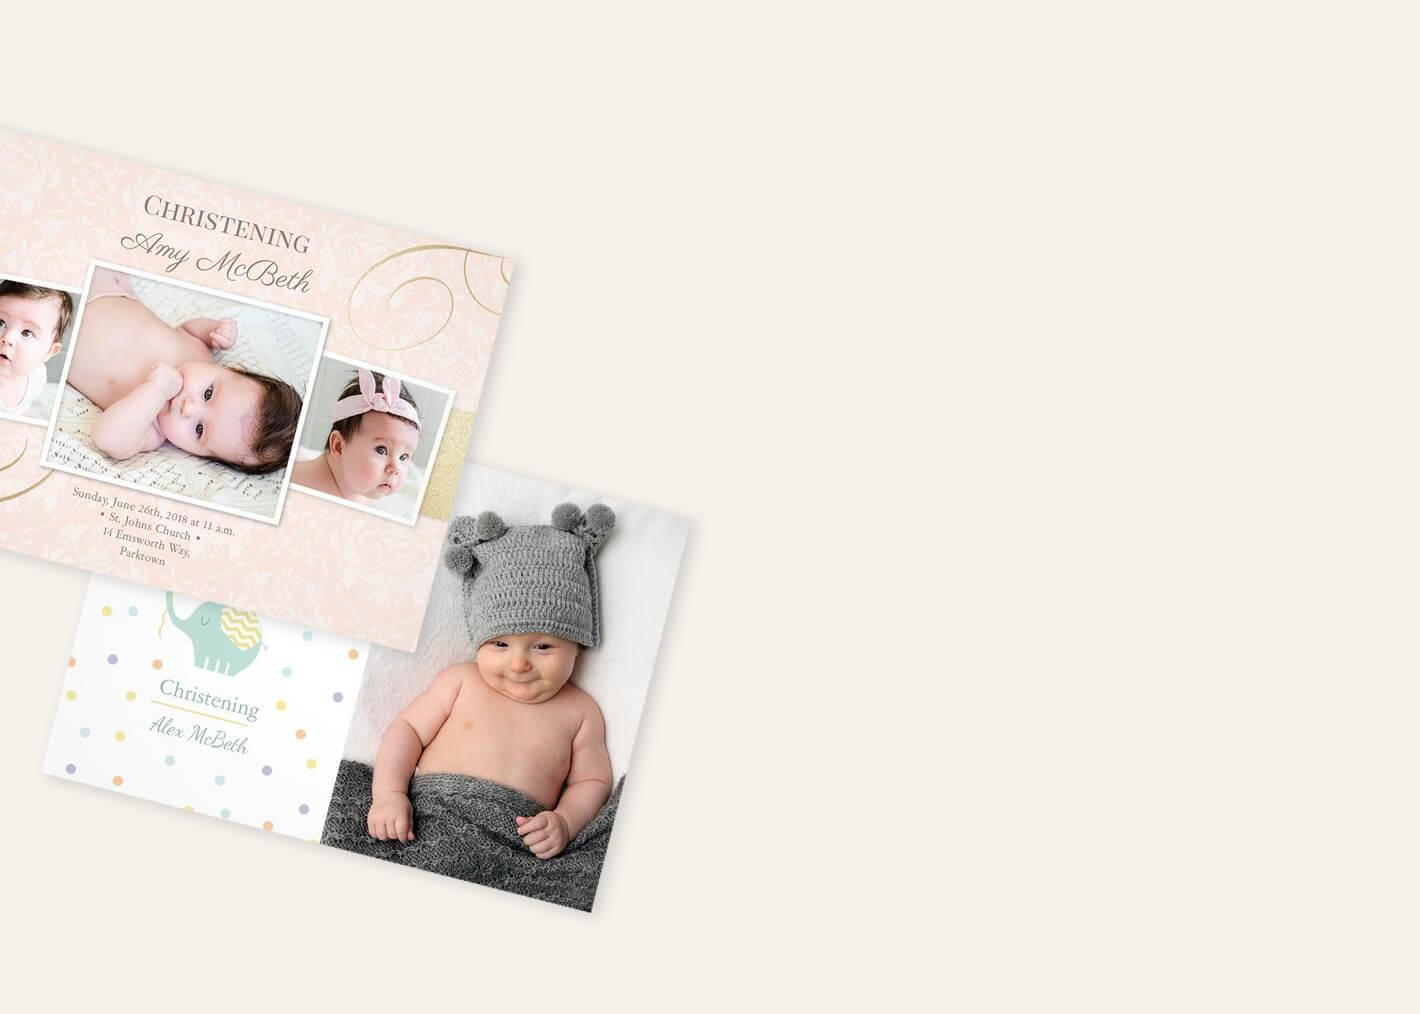 baptism invitations personalized baptism cards from optimalprint jpg 1420x1014 birthday christening invitation background